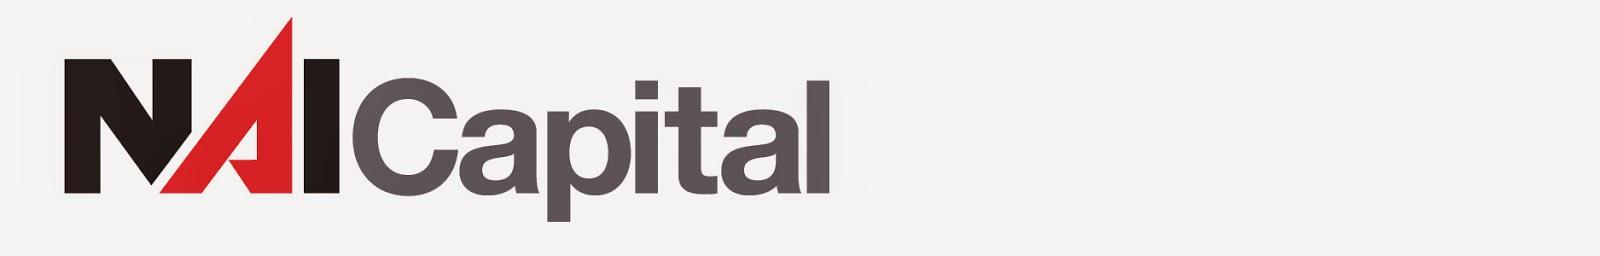 NAI Capital | The News Funnel